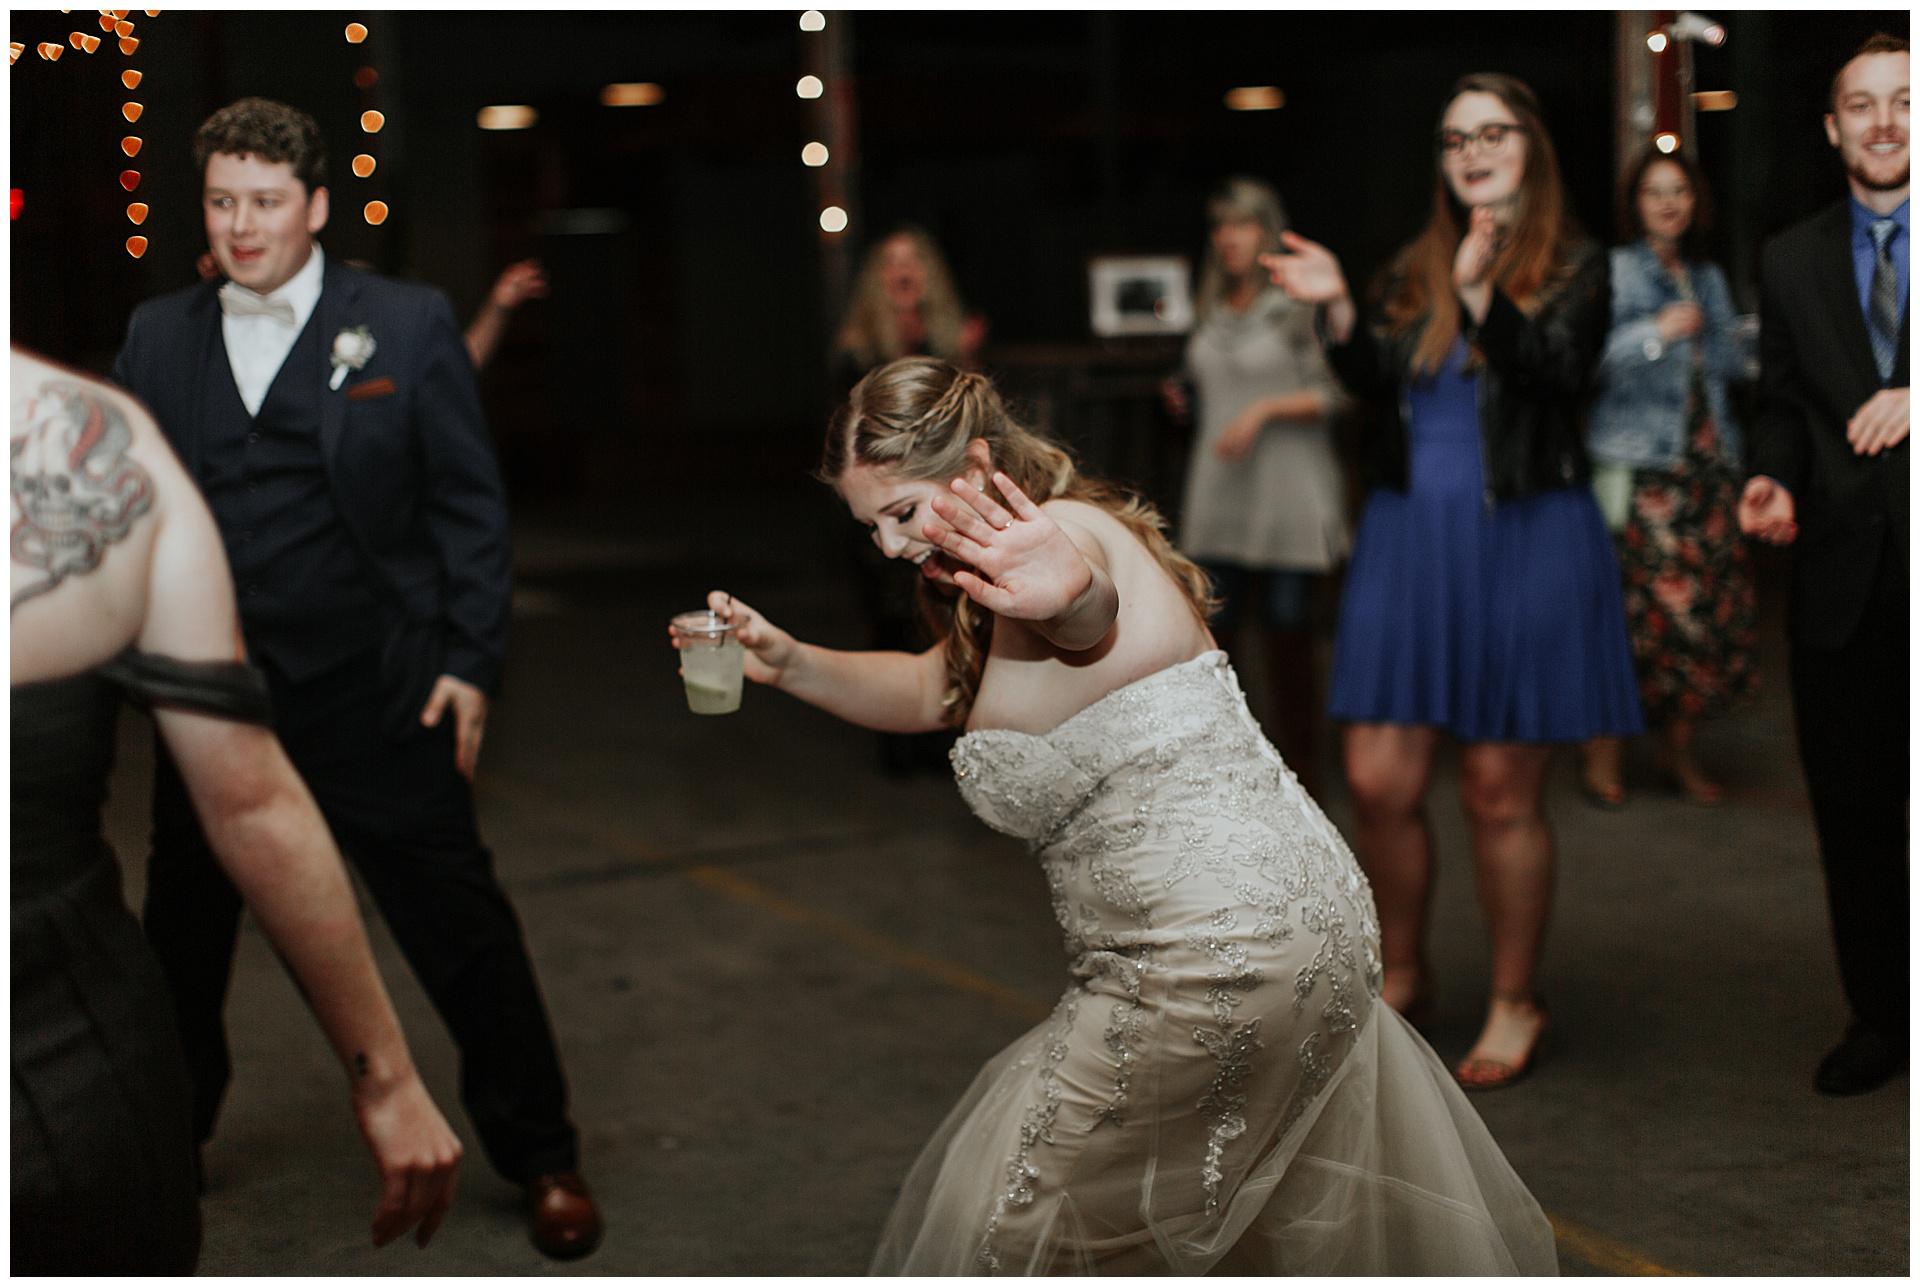 treaty oak glass factory wedding_mia dimare photography41.jpg